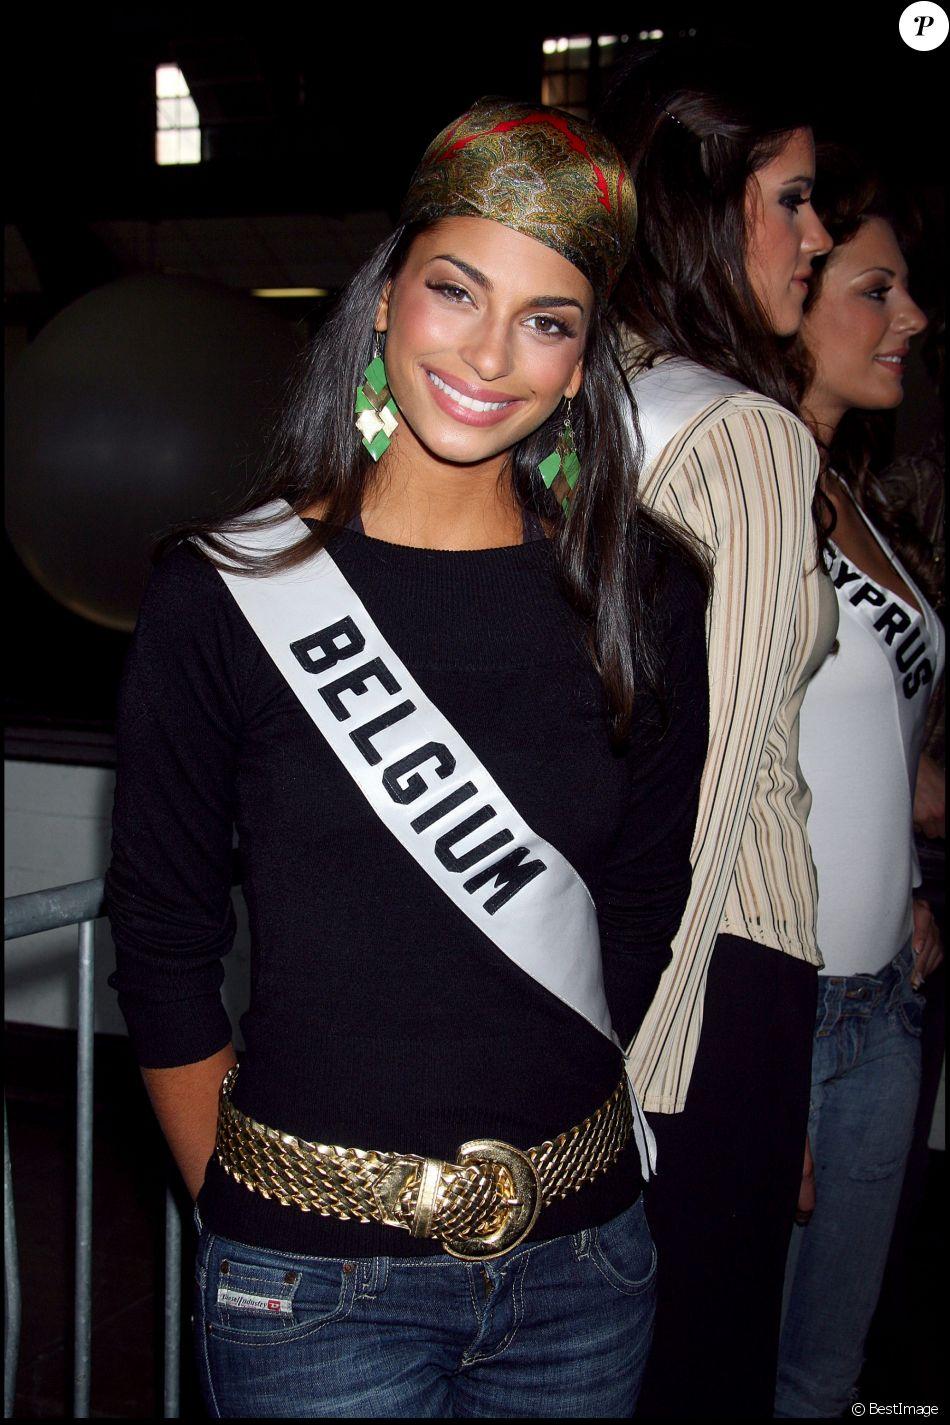 Tatiana silva ex miss belgique lors du concours miss univers 2006 purepeople - Tatiana silva et son compagnon ...